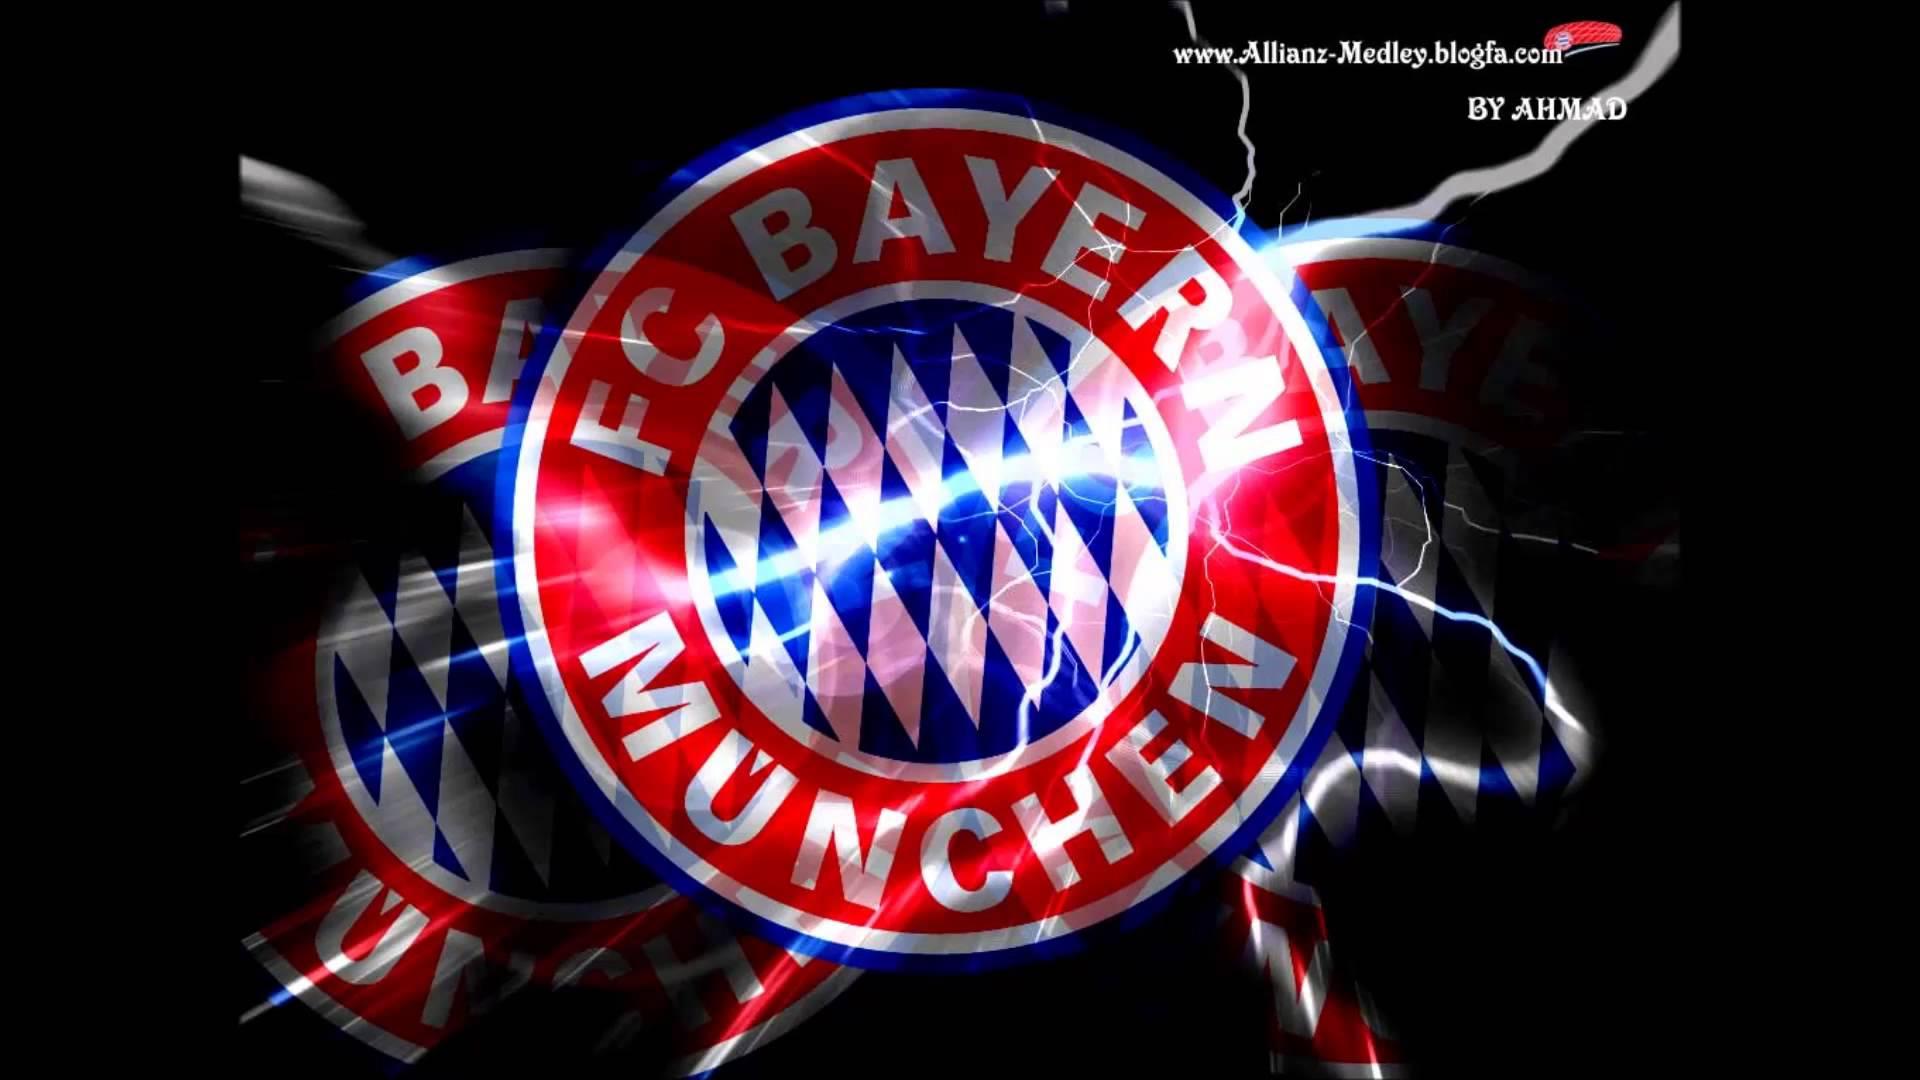 16 Luxury Pubg Wallpaper Iphone 6: 1920x1080px Bayern Munich IPhone Wallpaper